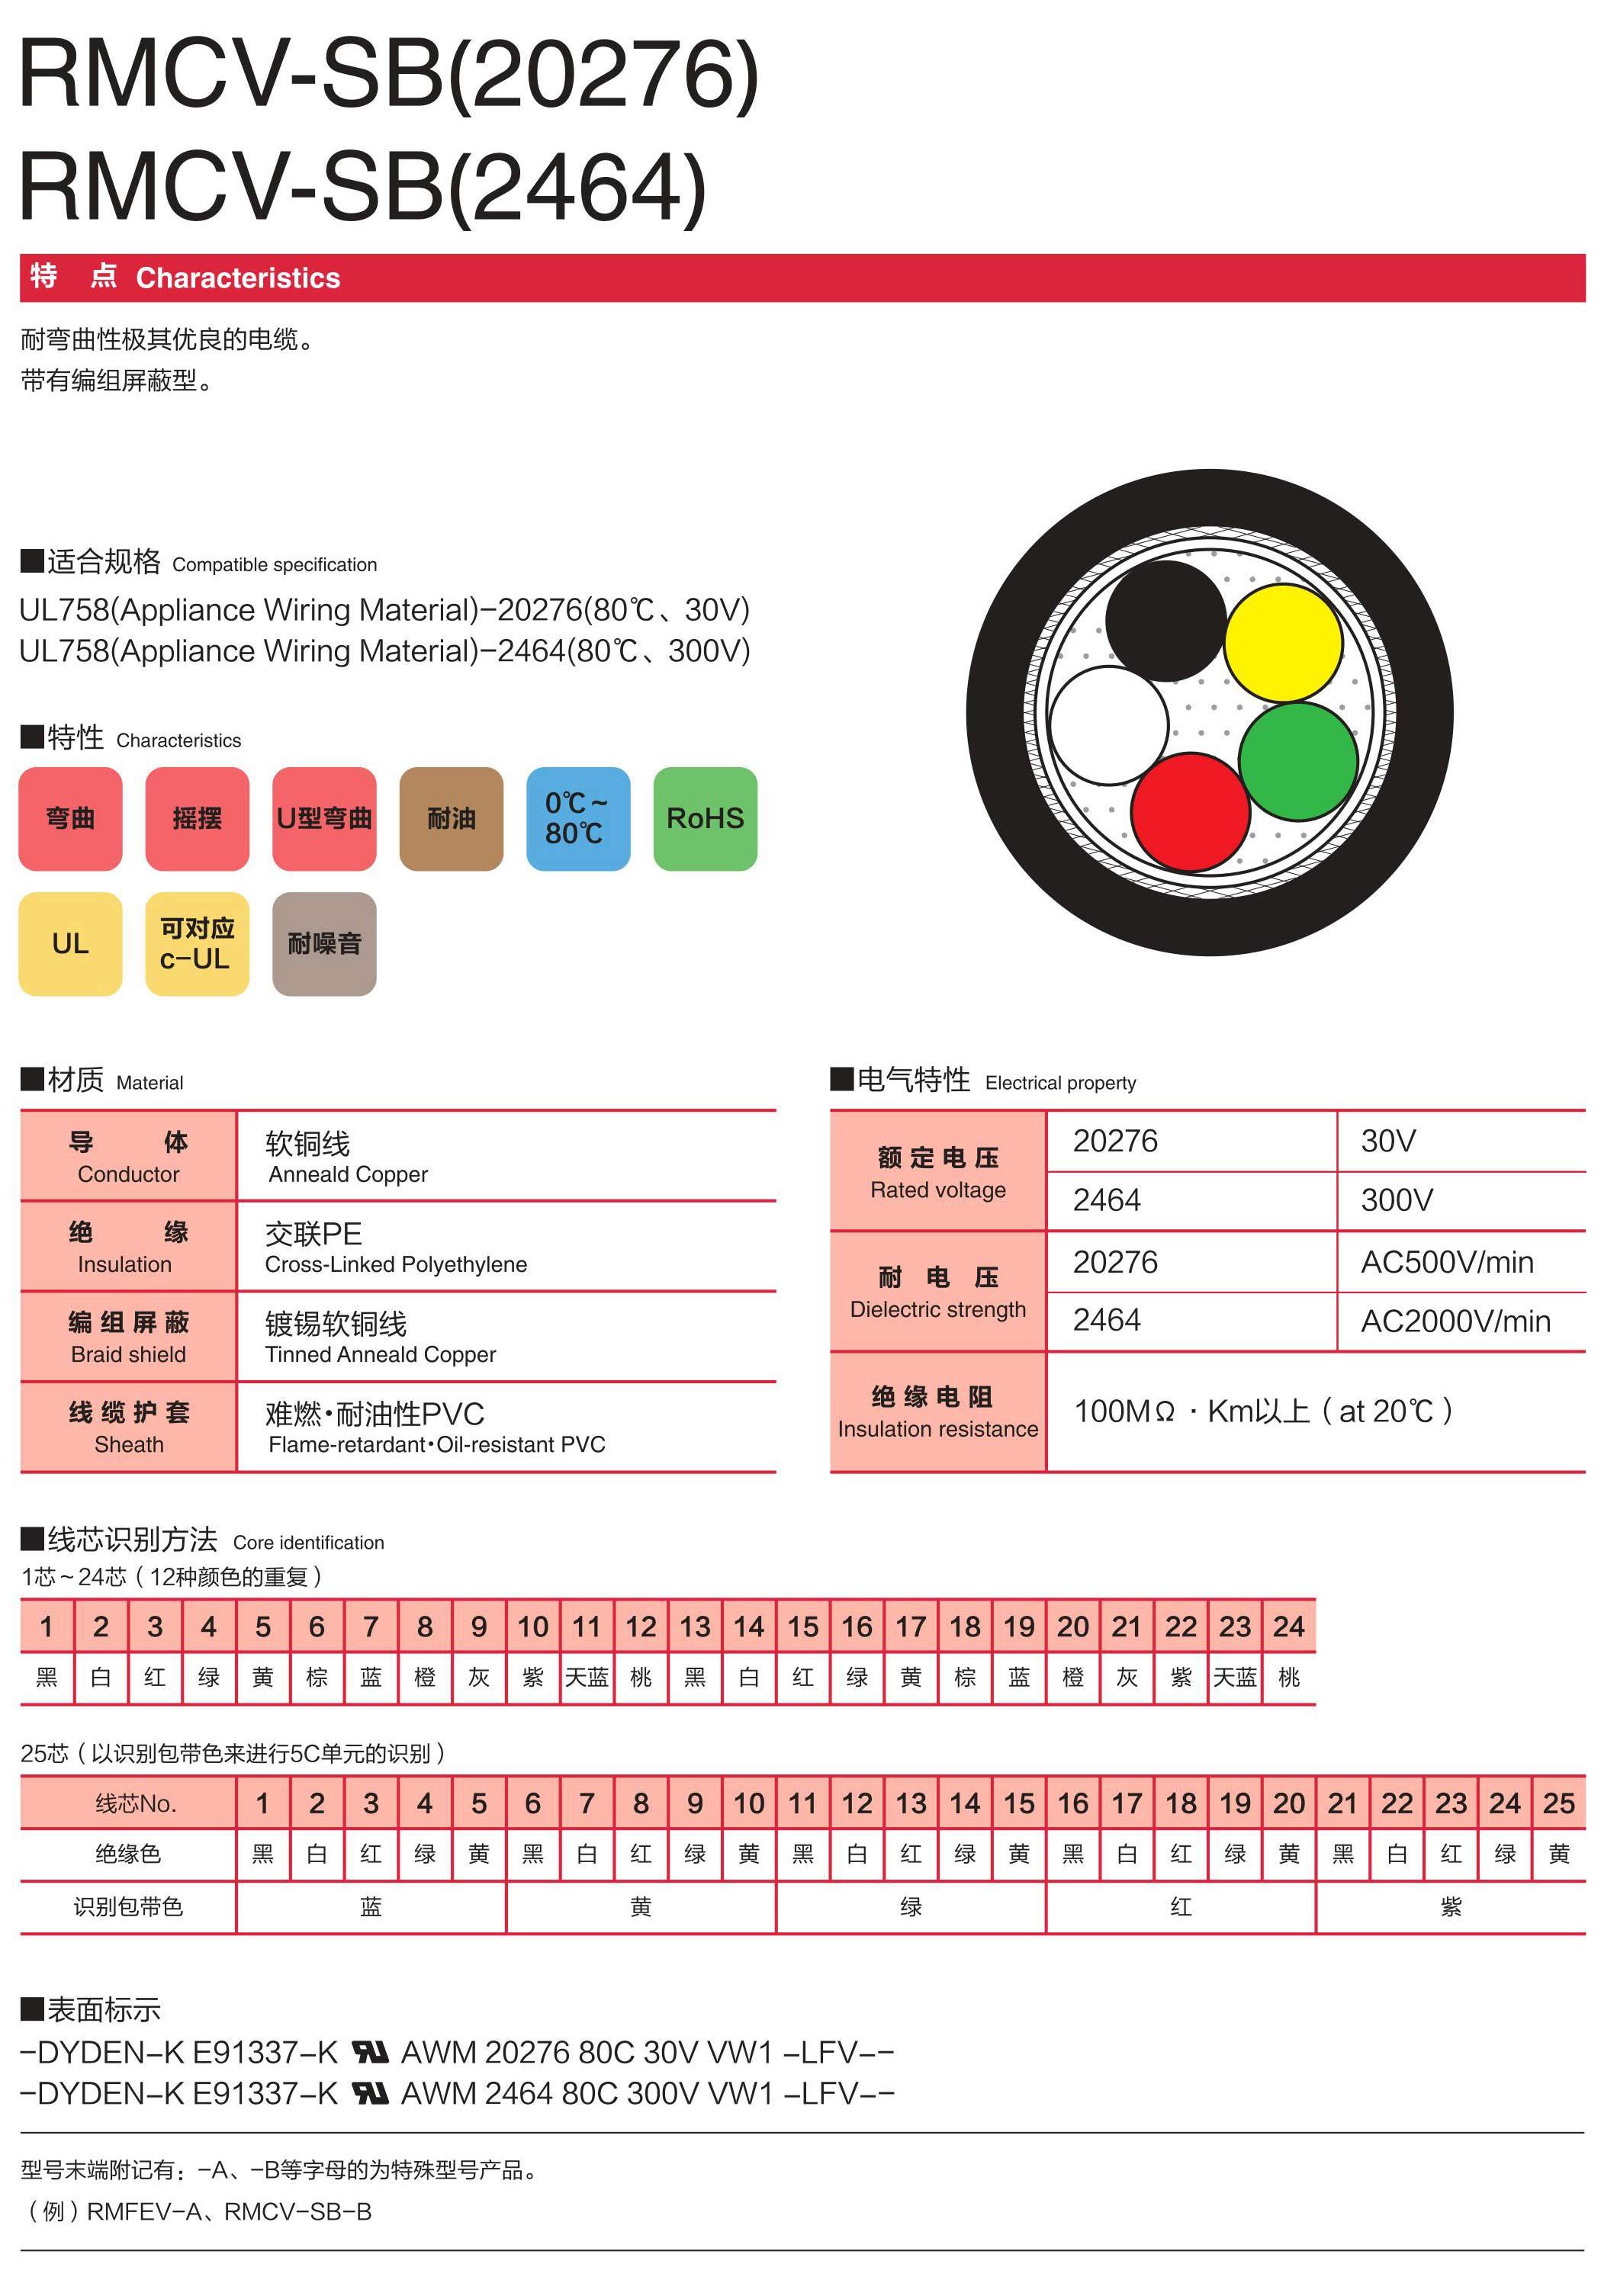 http://pmoe8be72.hkpic1.websiteonline.cn/upload/RMCV-SB(20276)(2464)1.jpg